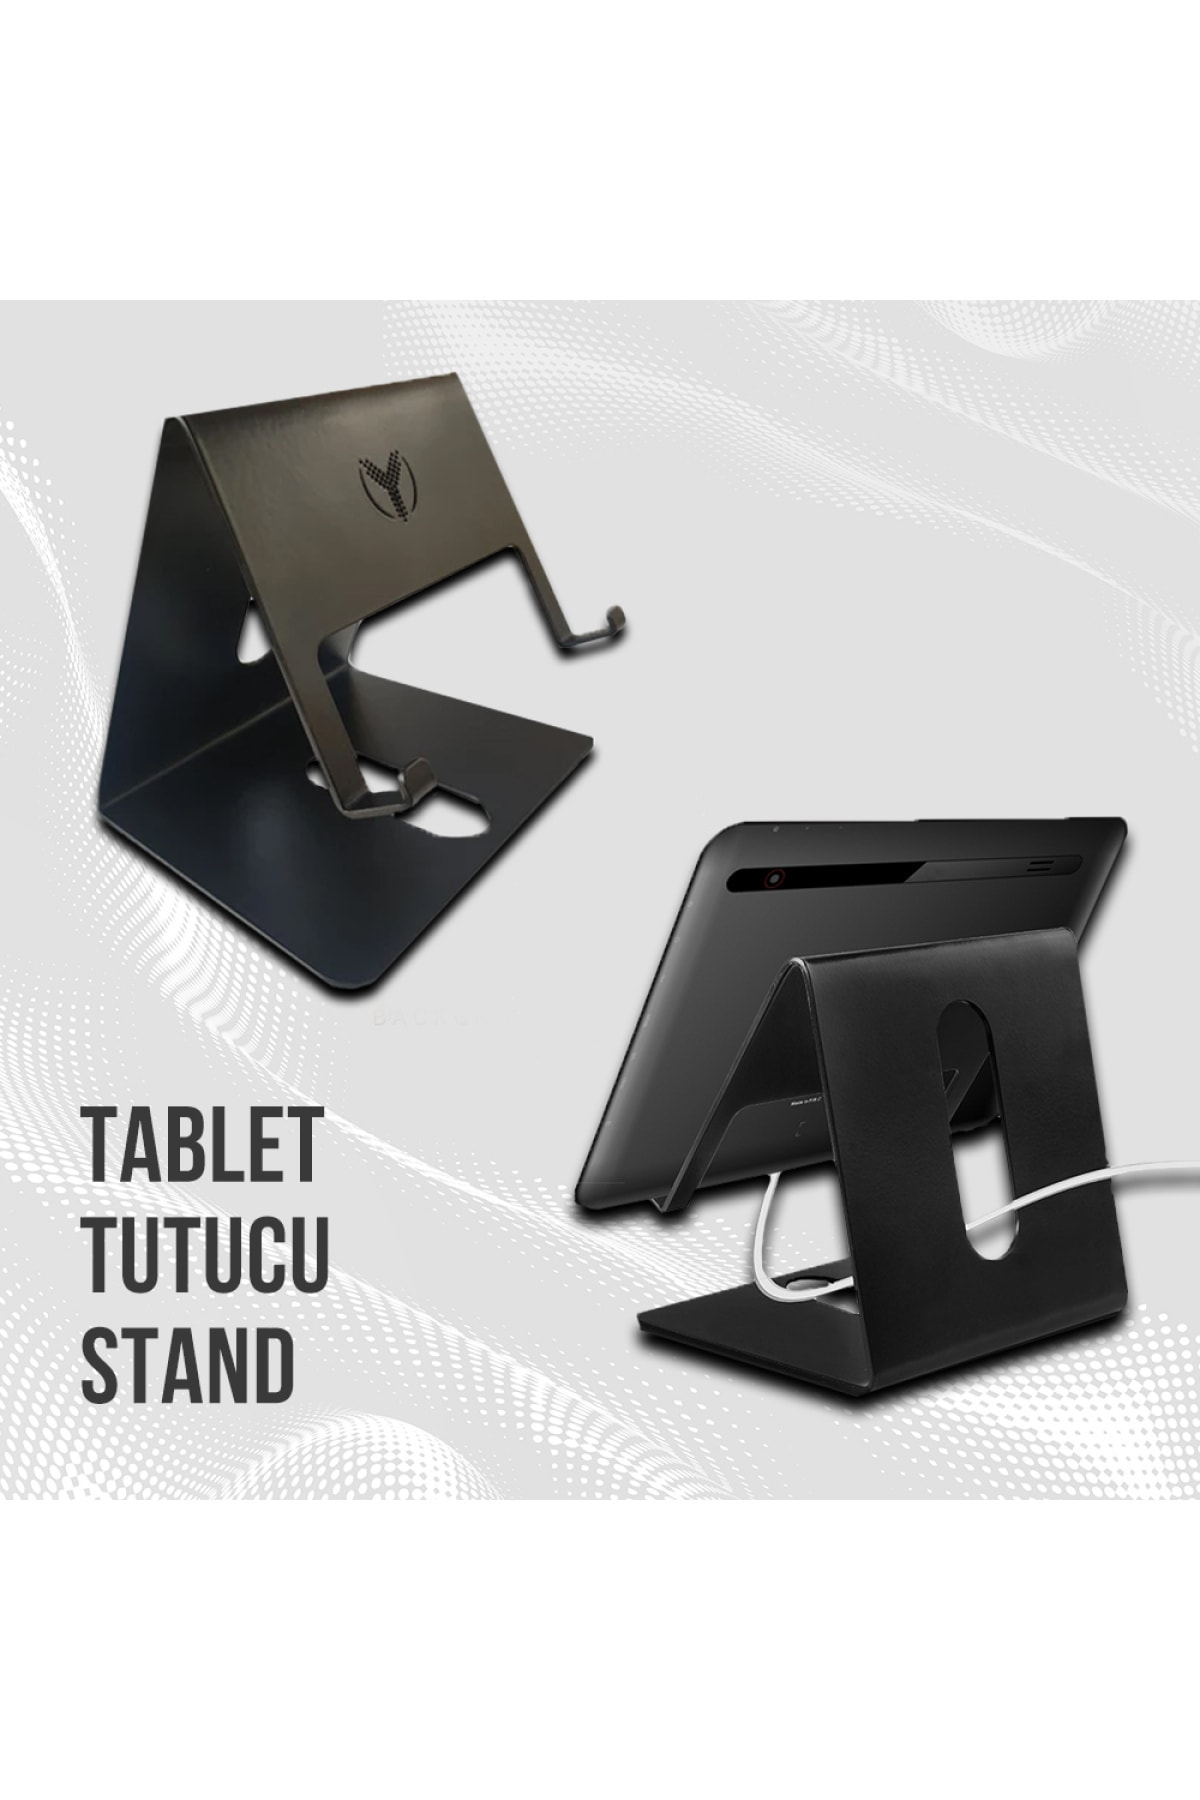 Yücecengiz Metal Masaüstü Metal Tablet Tutucu Stand 2